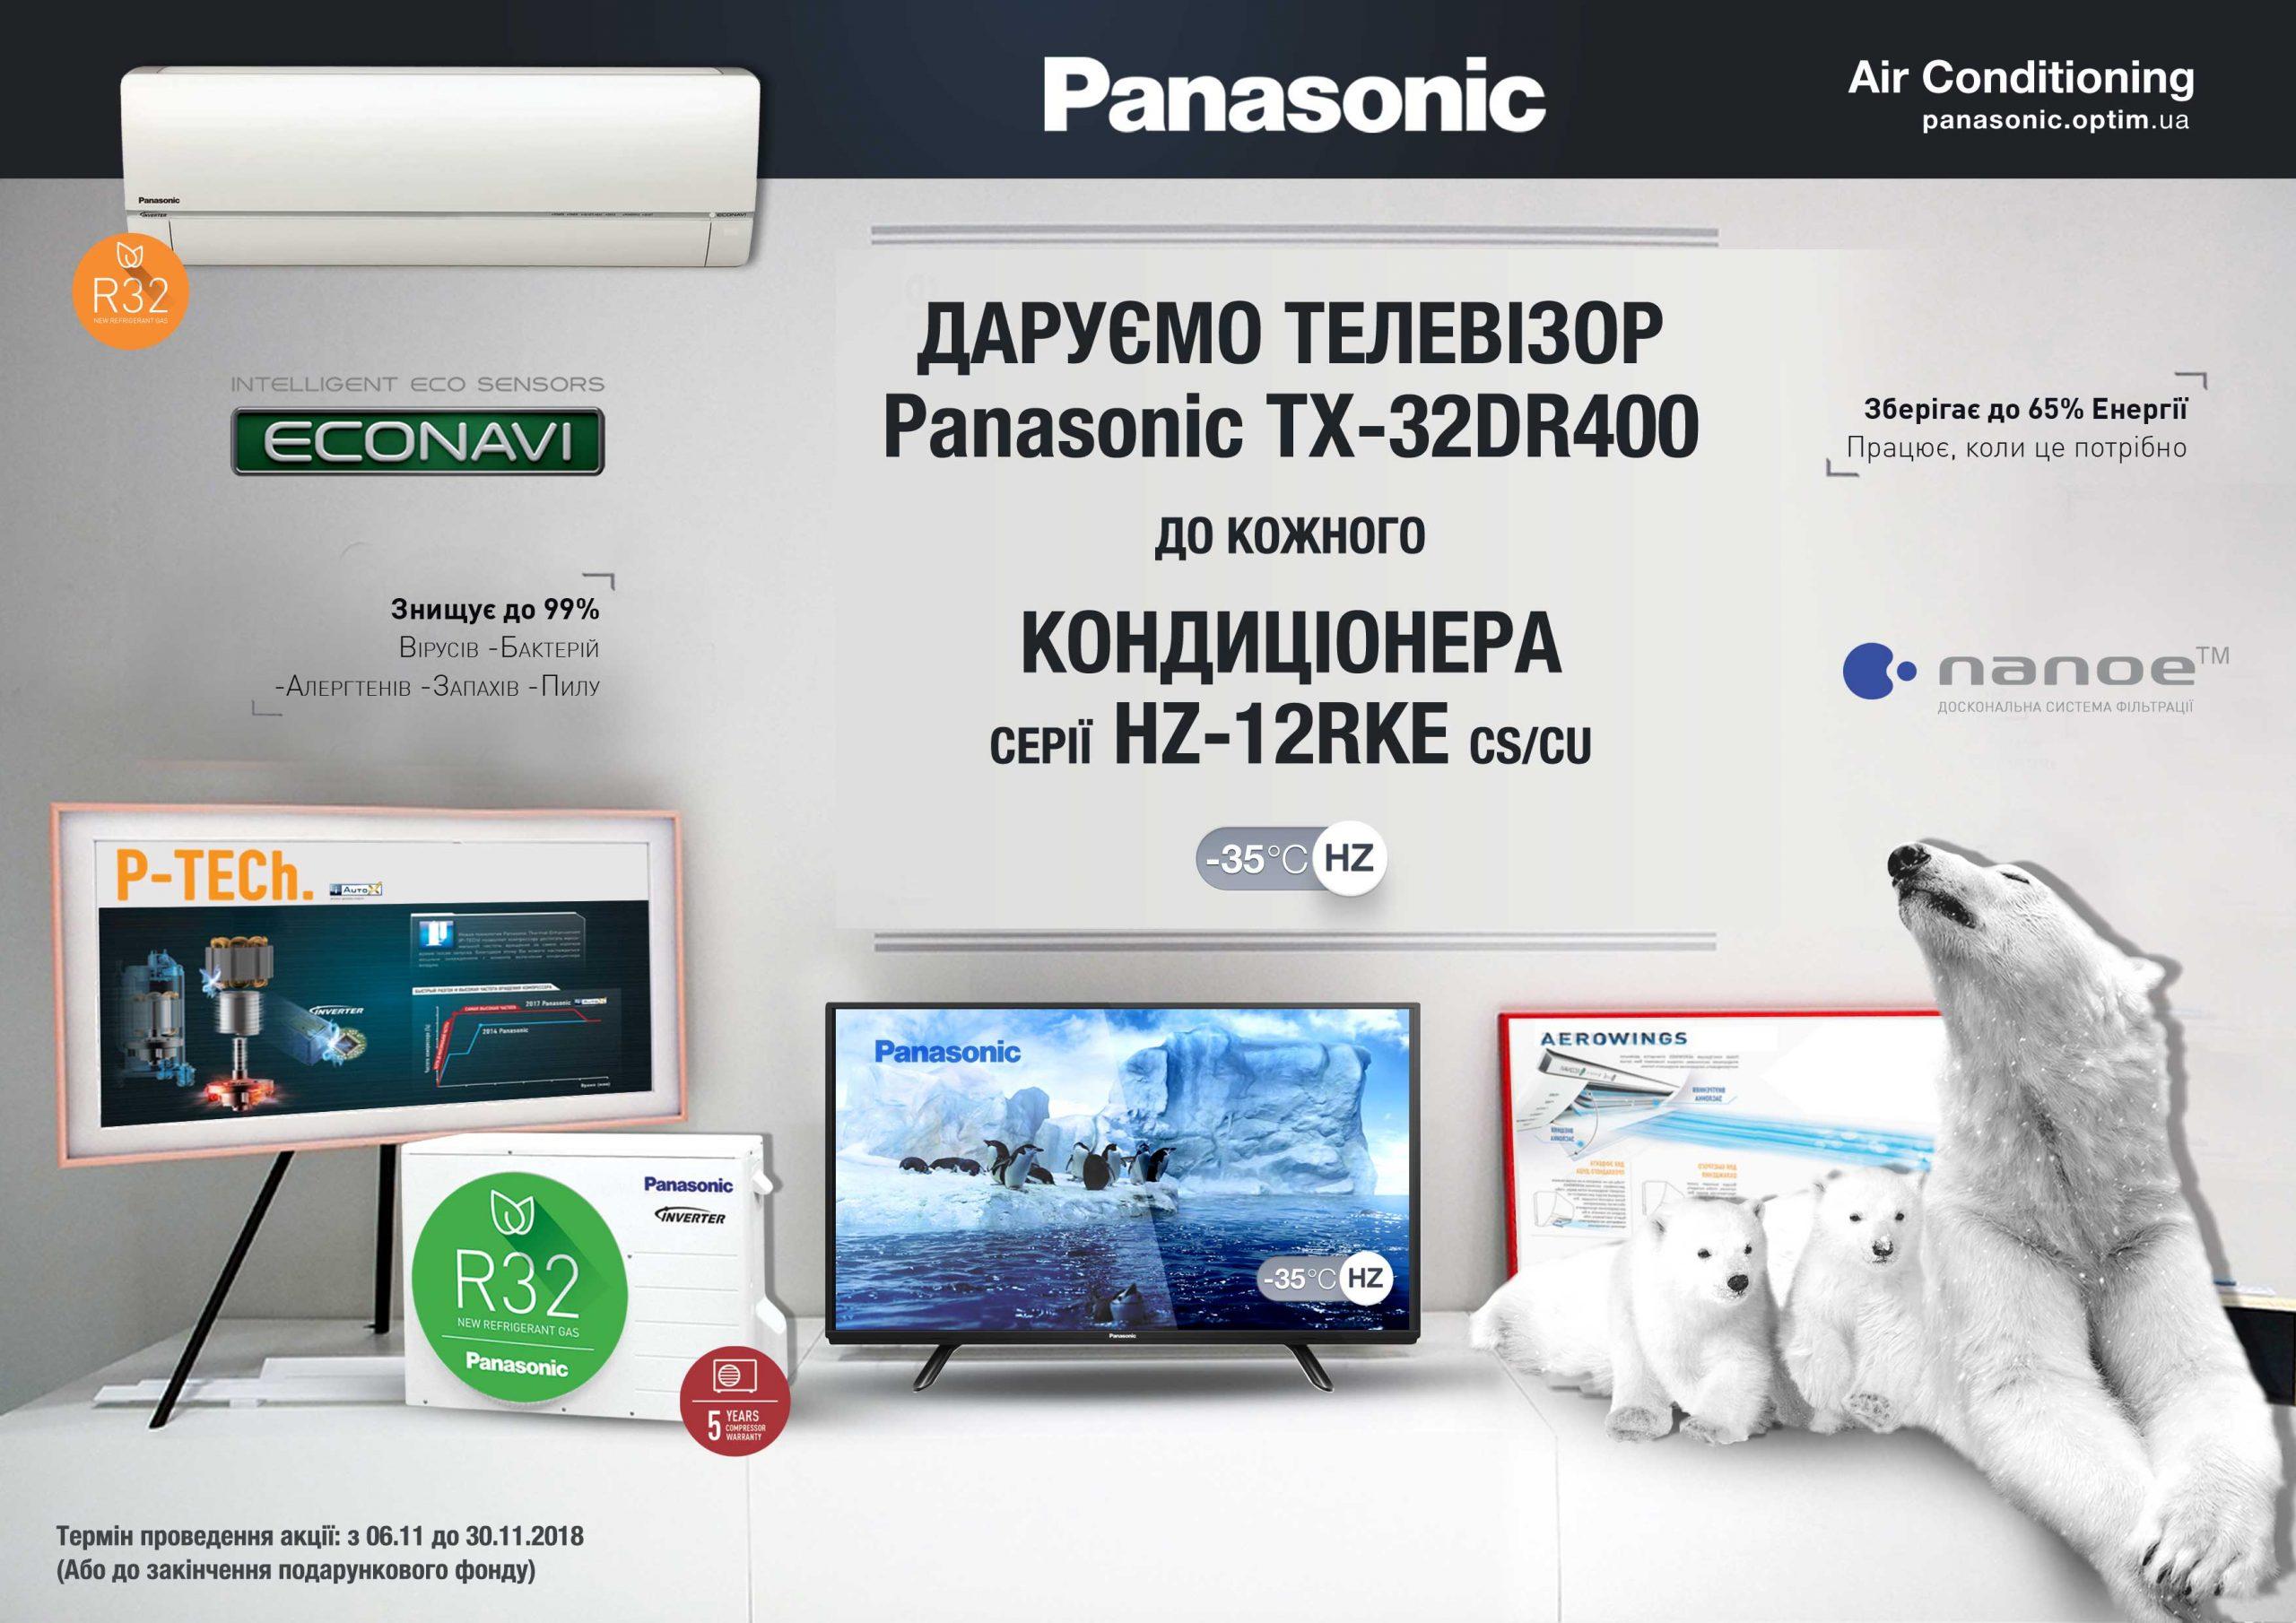 Акция на кондиционер Panasonic!